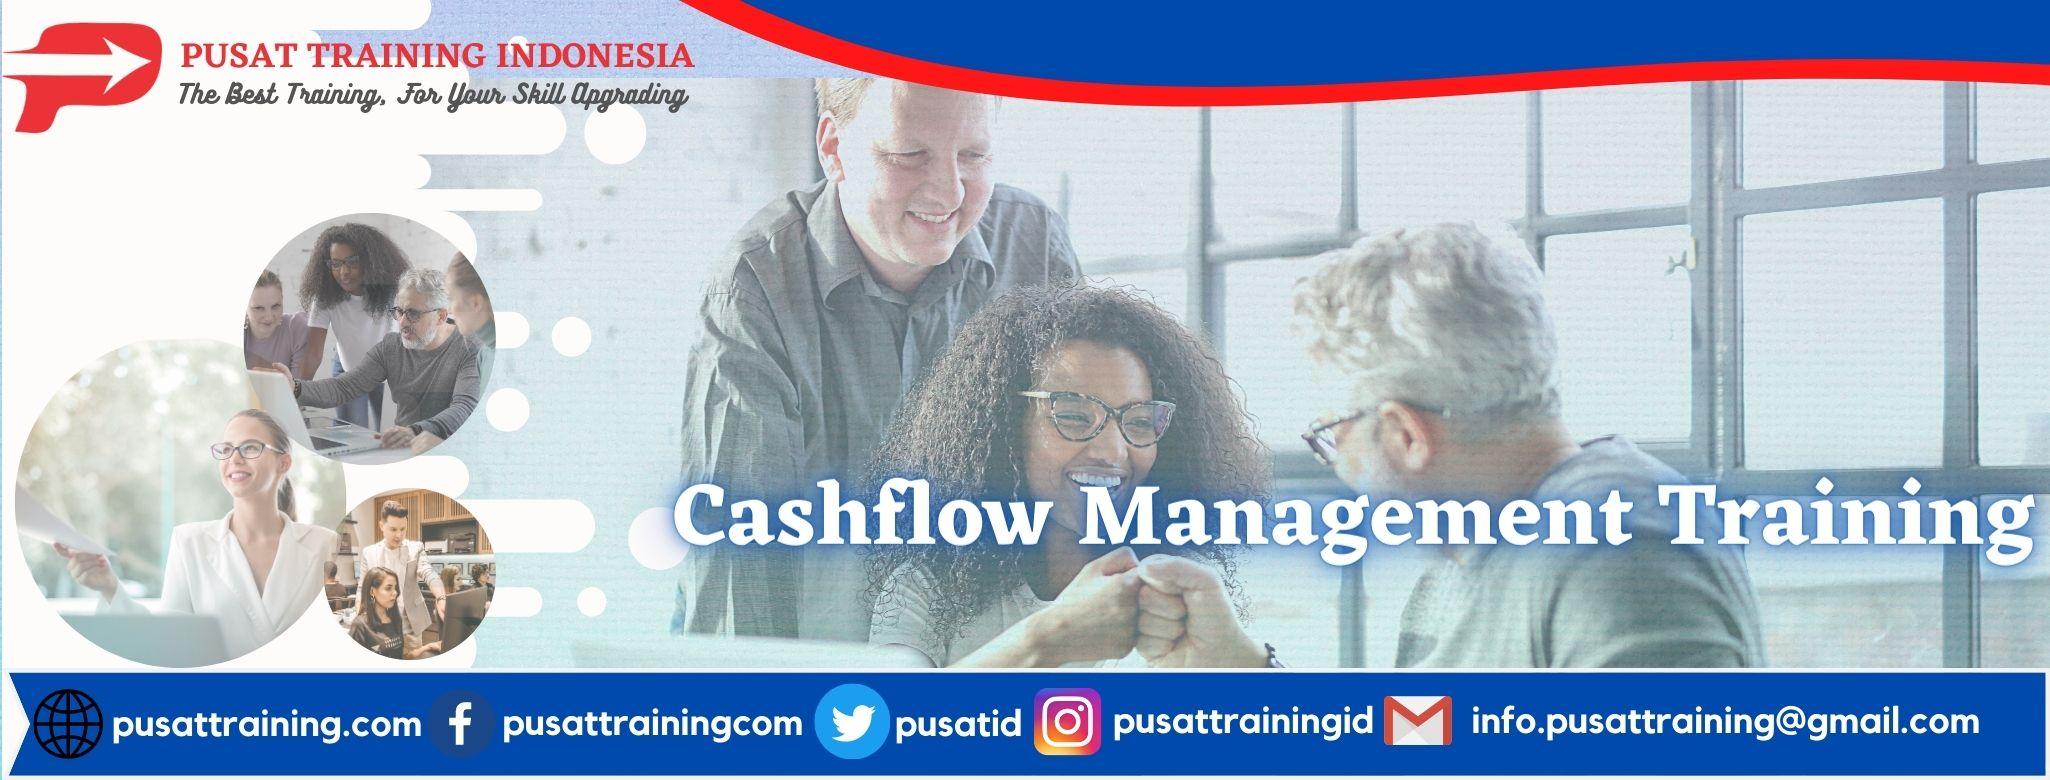 Cashflow-Management-Training